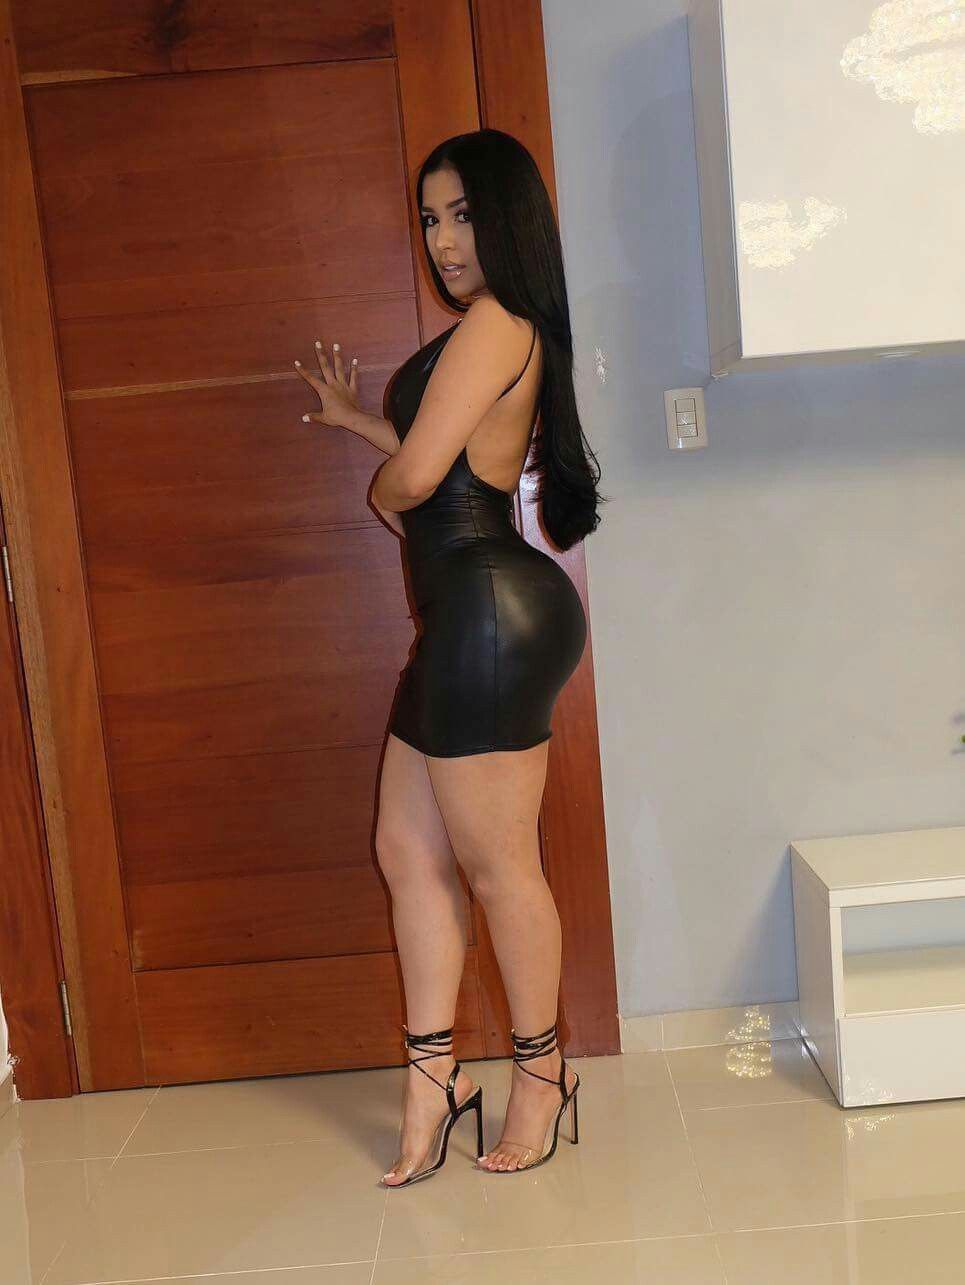 Big Tit Latina Casting Couch